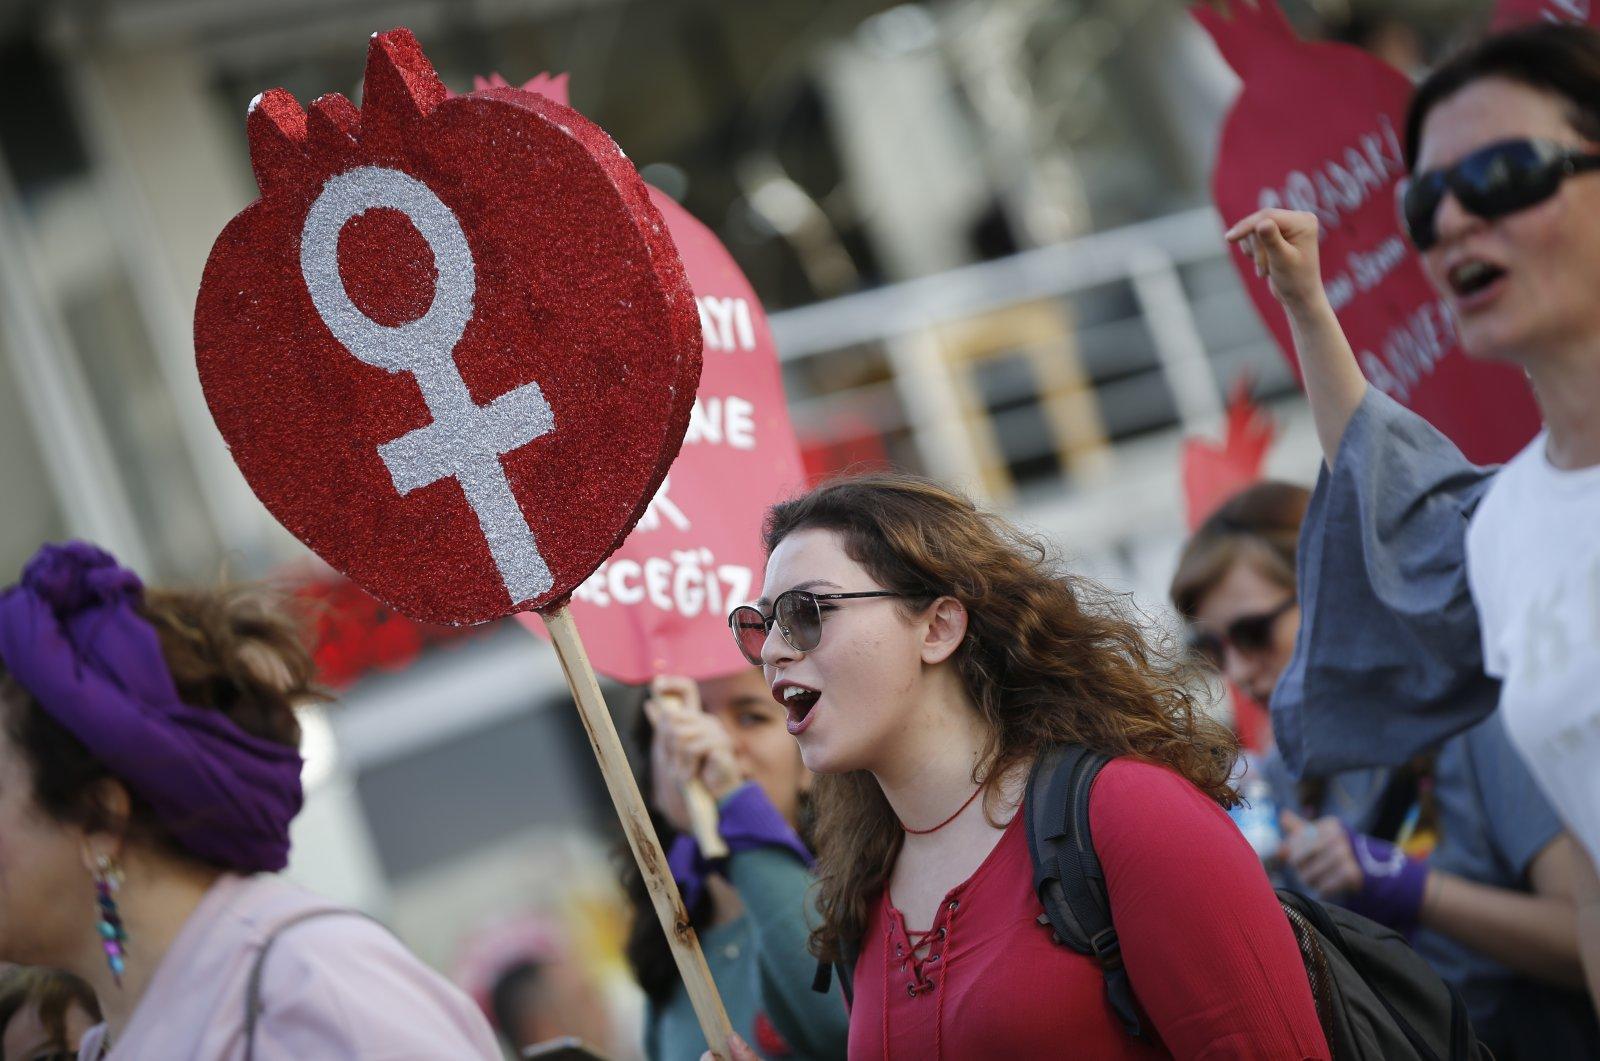 Women march in celebration of International Women's Day in Antalya, March 8, 2020. (AA Photo)